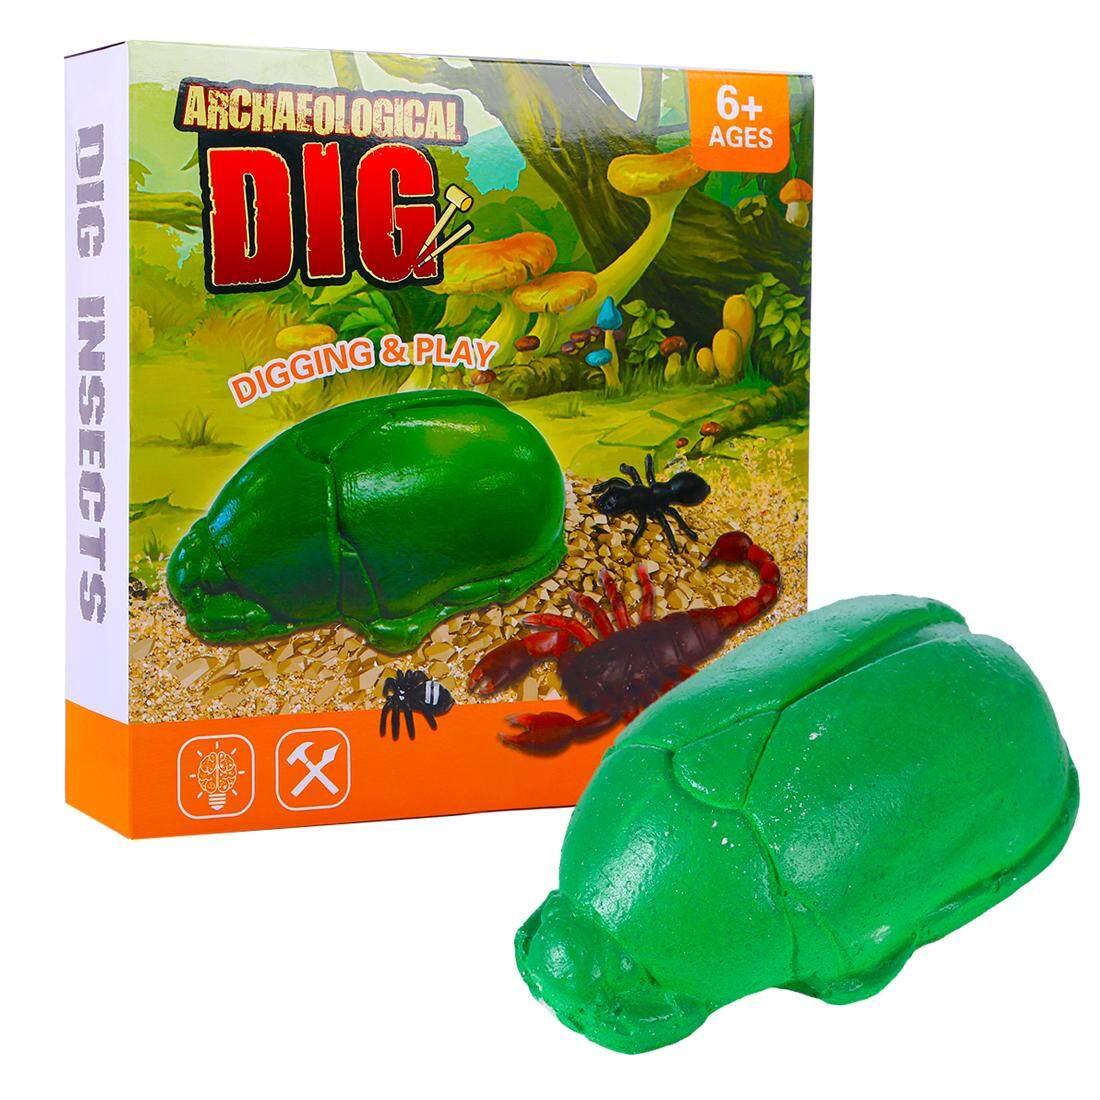 360DSC Anak-anak Serangga Fosil Arkeologi Mainan Penggalian